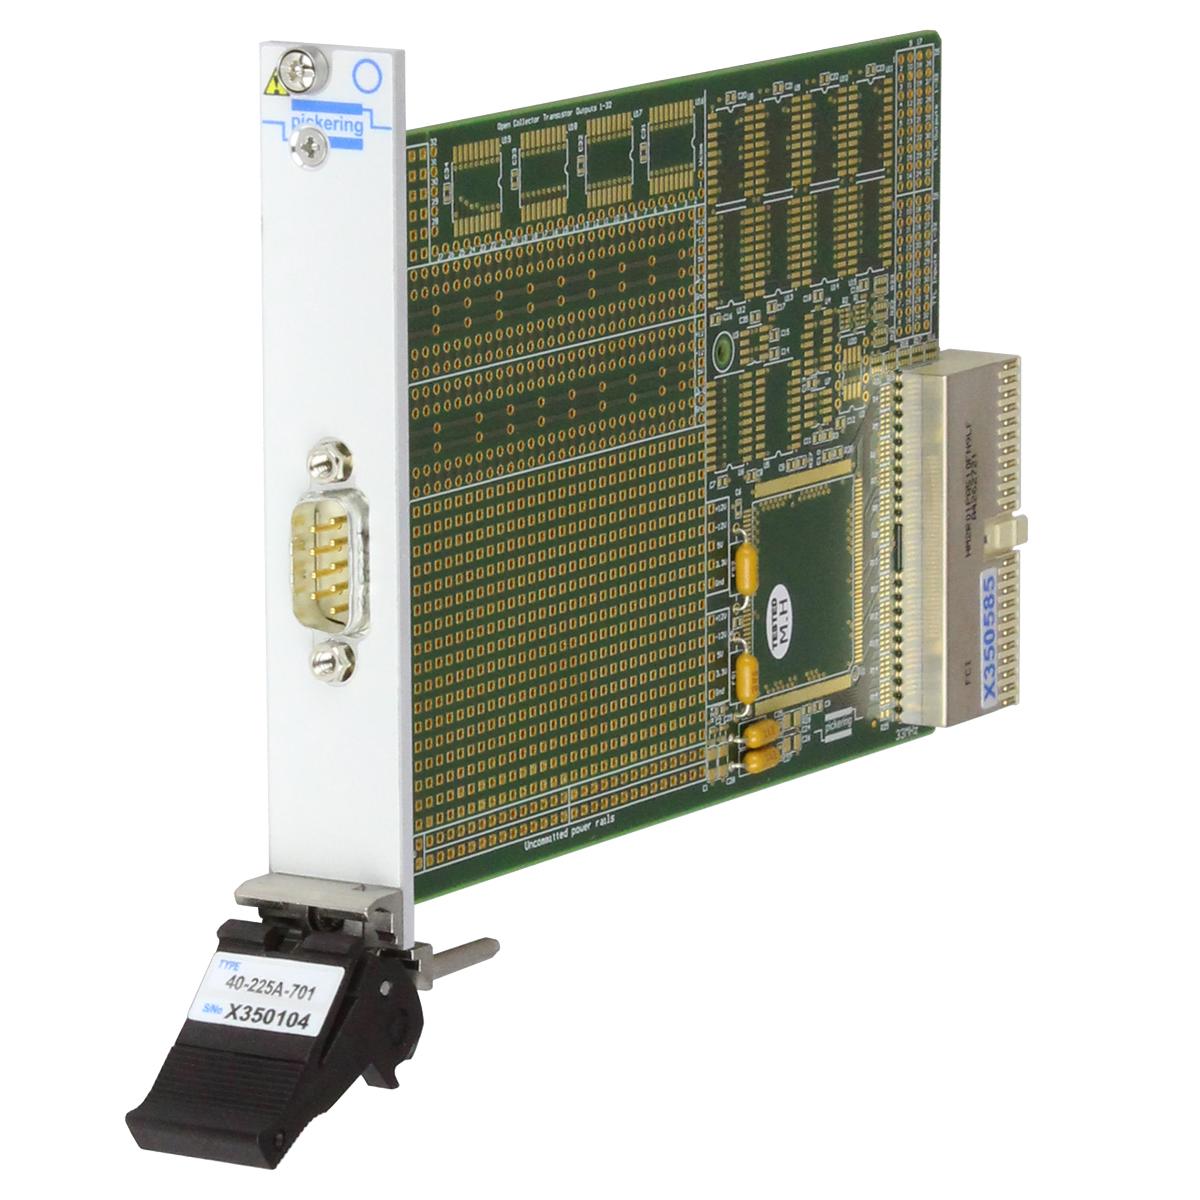 PXI Prototyping Module, 1-Slot, 9-way D-type - 40-225A-701